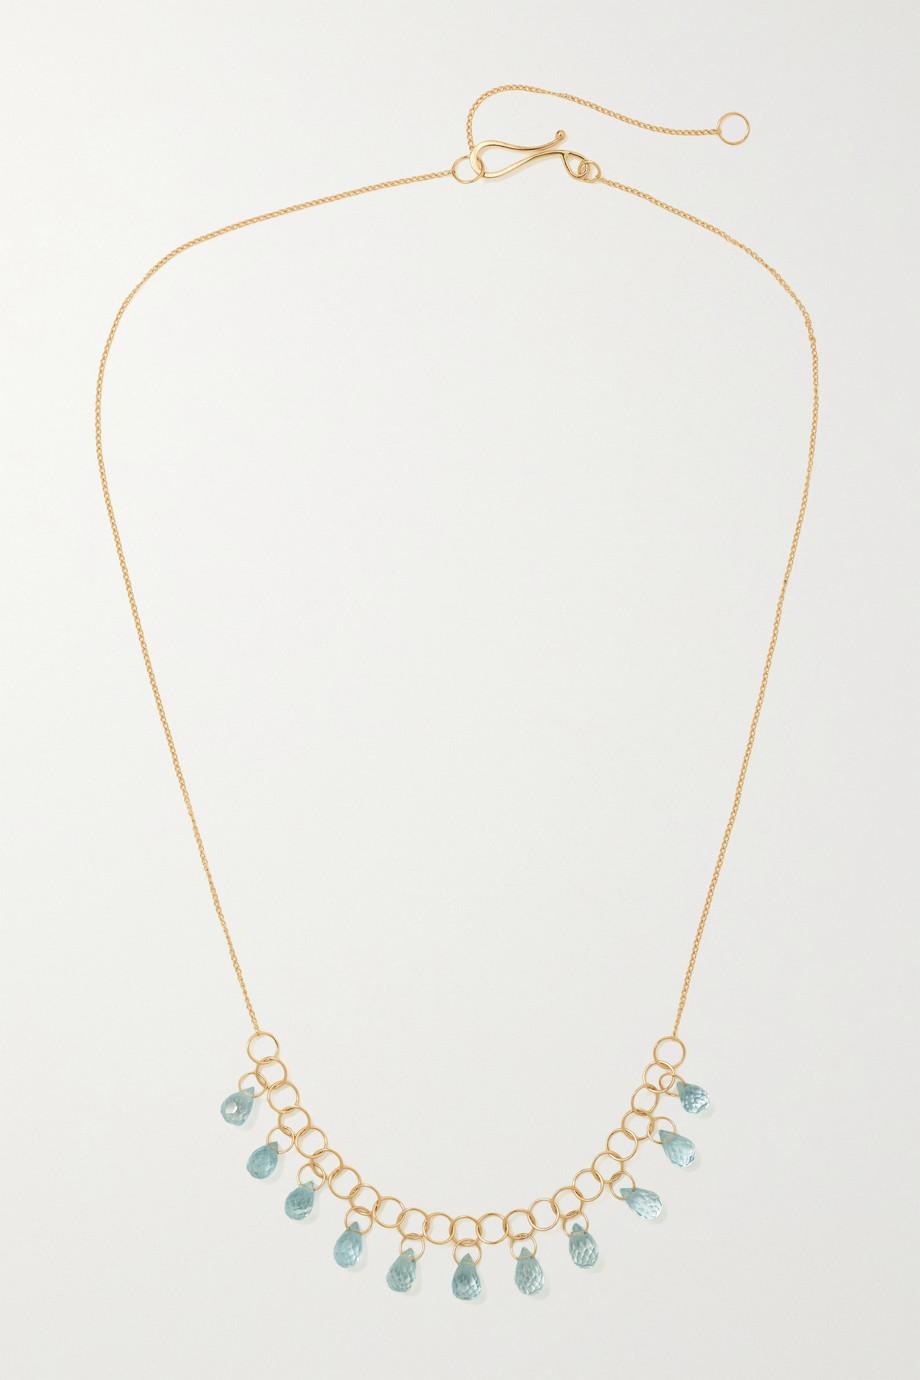 Melissa Joy Manning 14-karat recycled gold topaz necklace